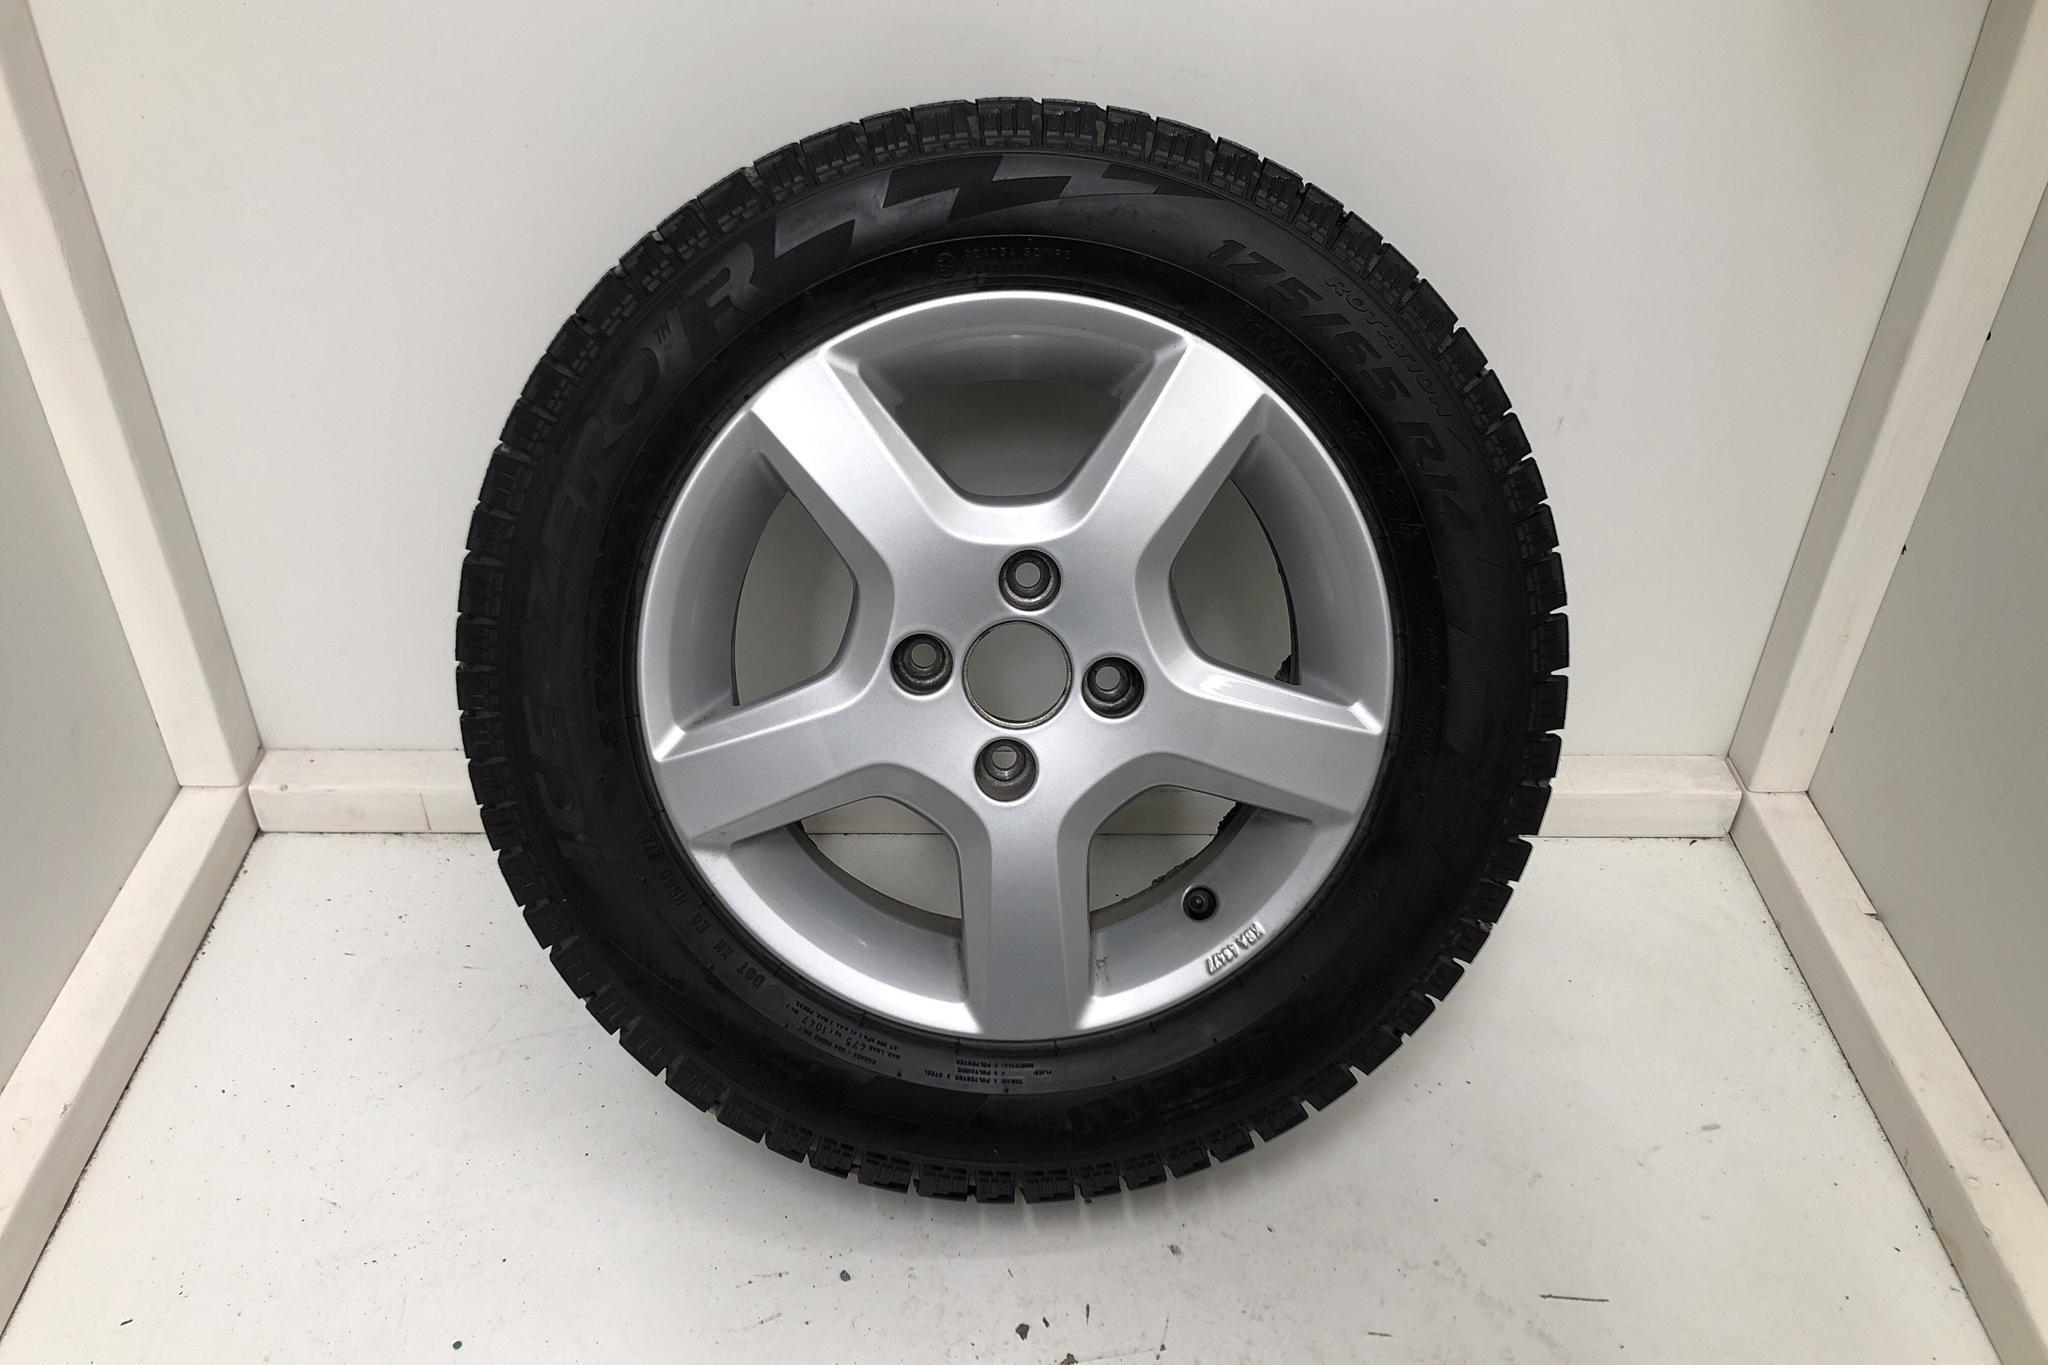 VW up! 1.0 5dr (75hk) - 3 574 mil - Manuell - vit - 2016